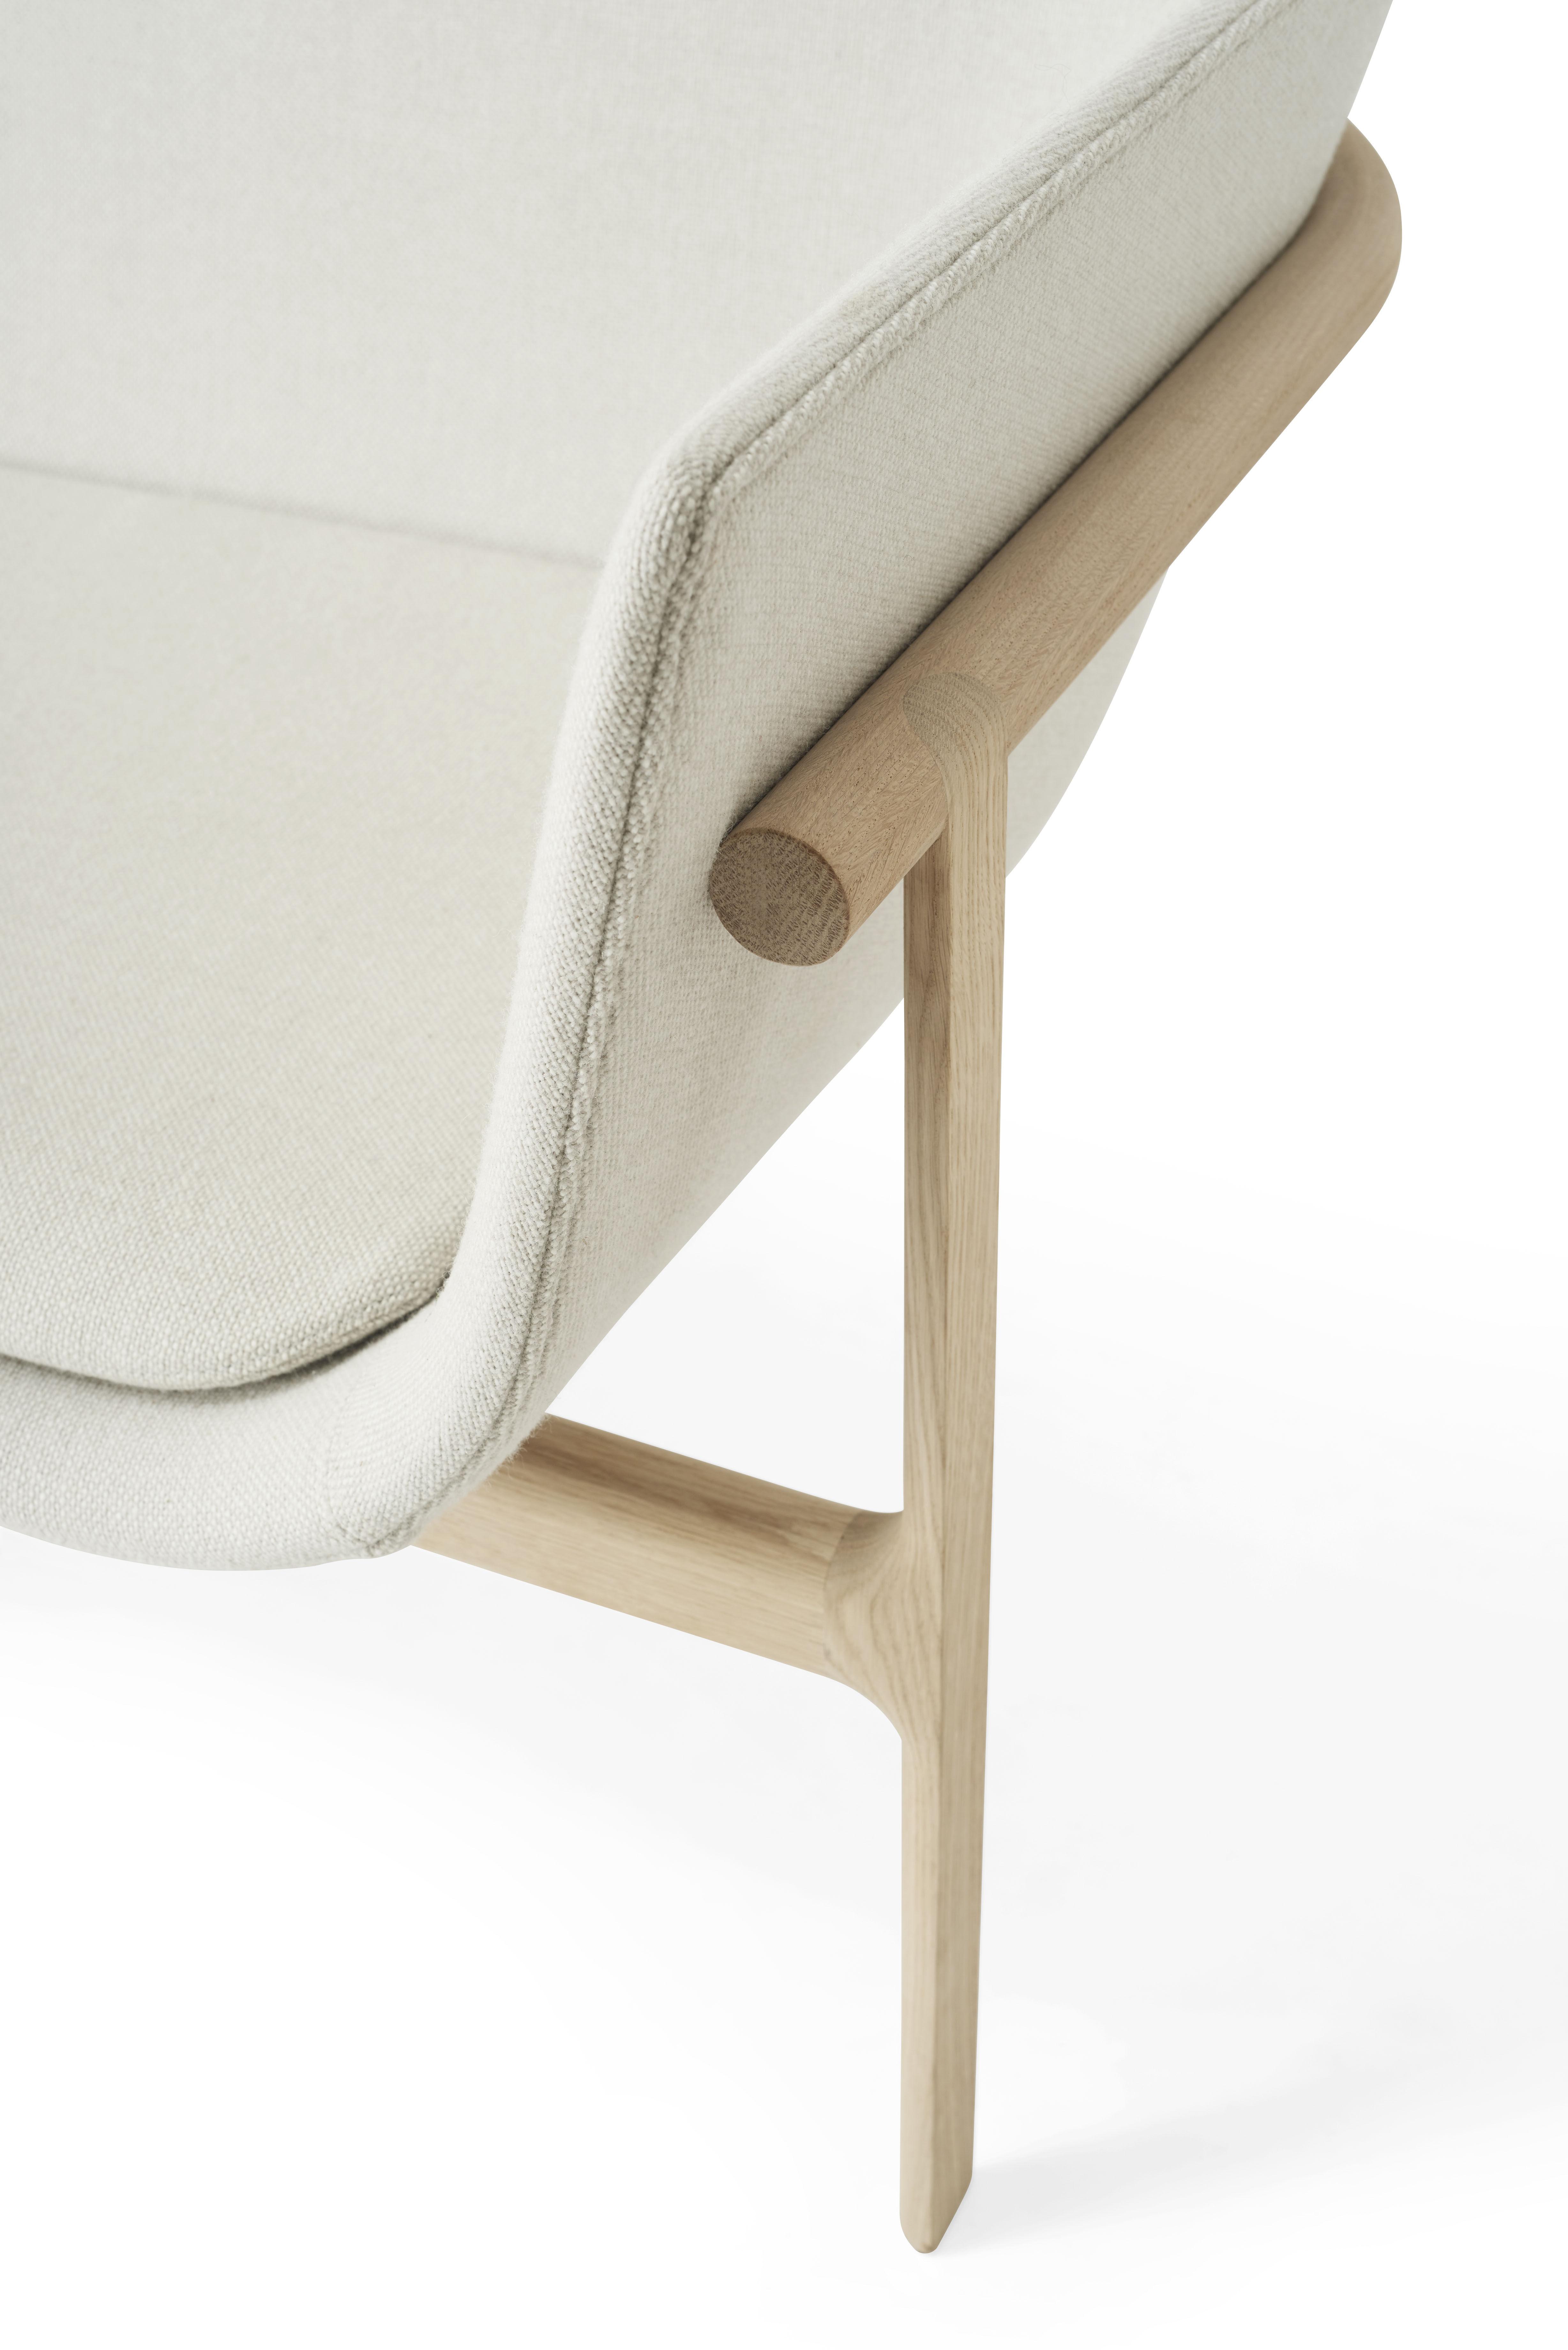 canap droit tailor tissu l 180 cm tissu blanc bois menu. Black Bedroom Furniture Sets. Home Design Ideas